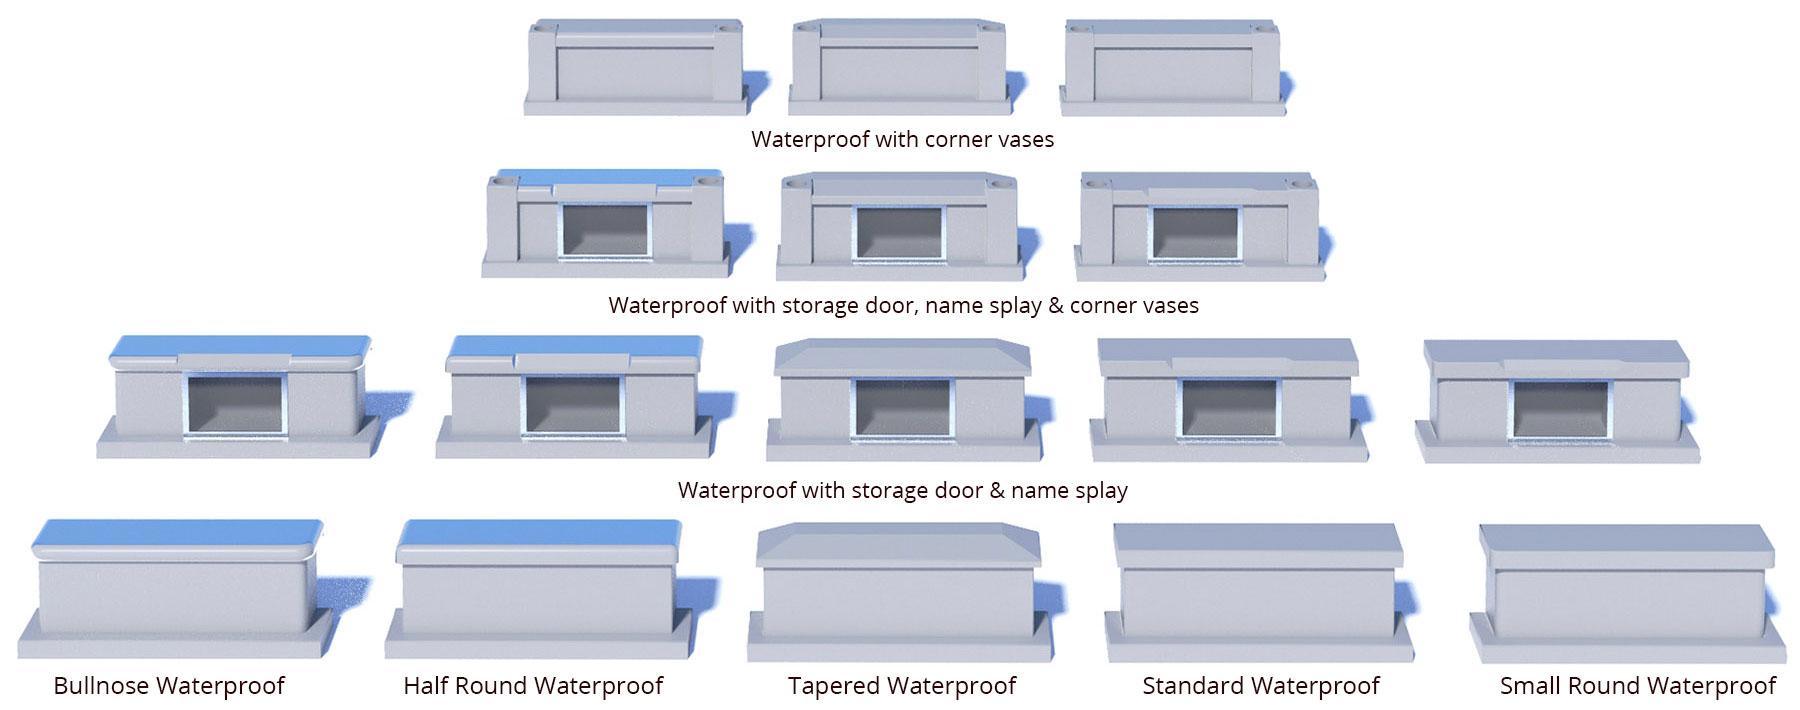 Waterprrof Front Stone Options